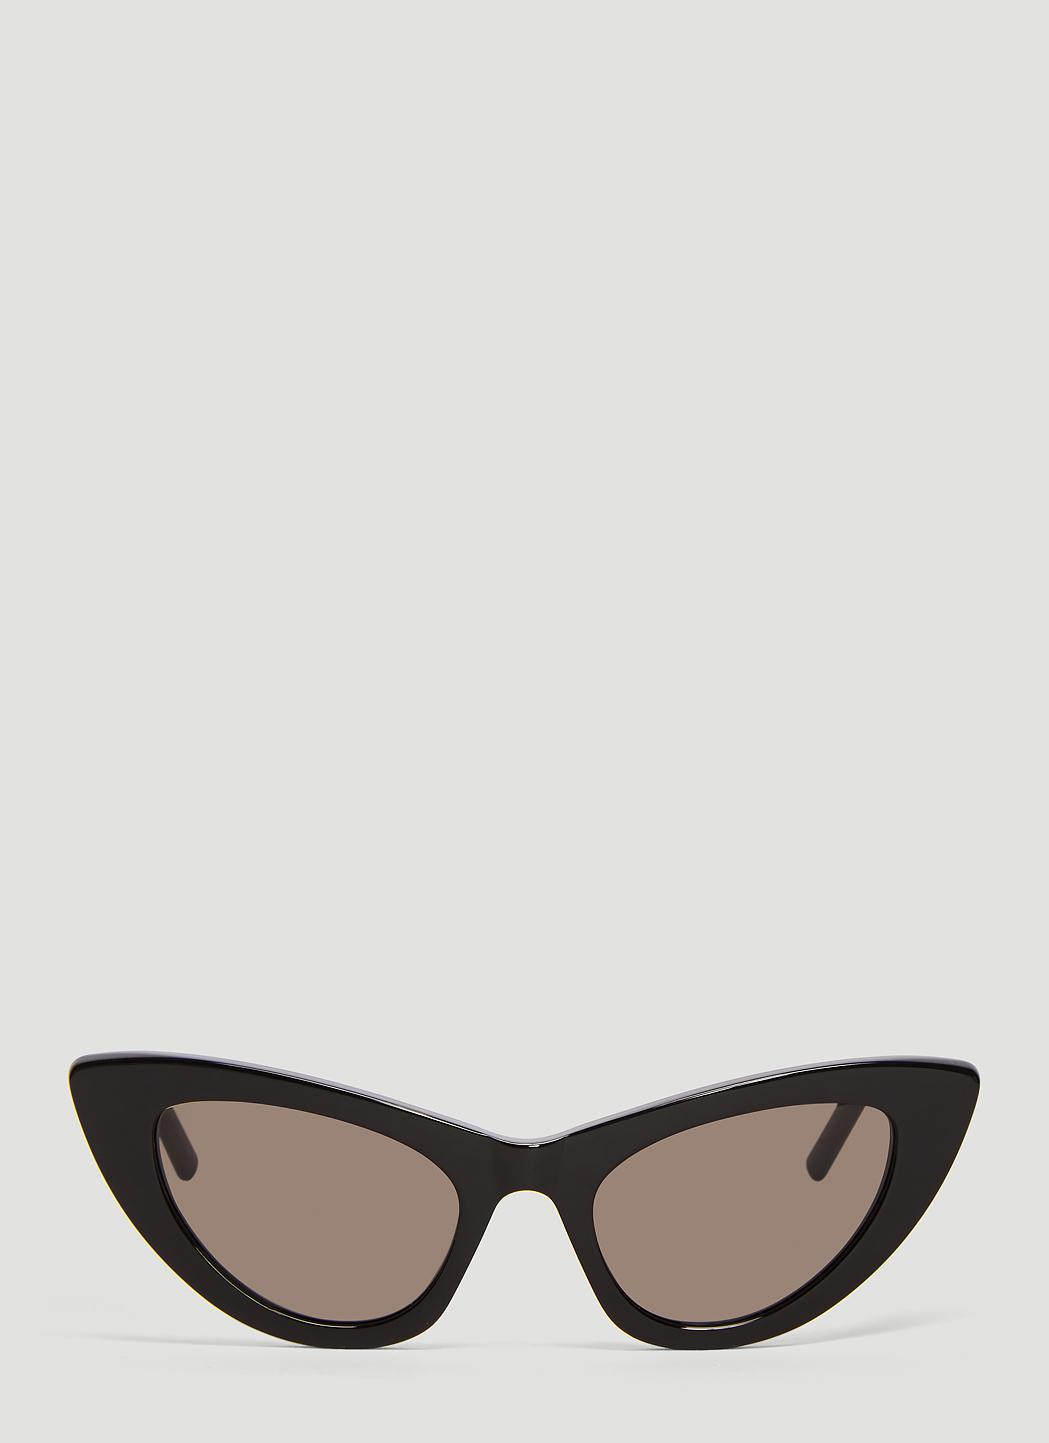 9356db04fcc8f Lyst - Saint Laurent Sl 213 Lily Sunglasses In Black in Black for Men